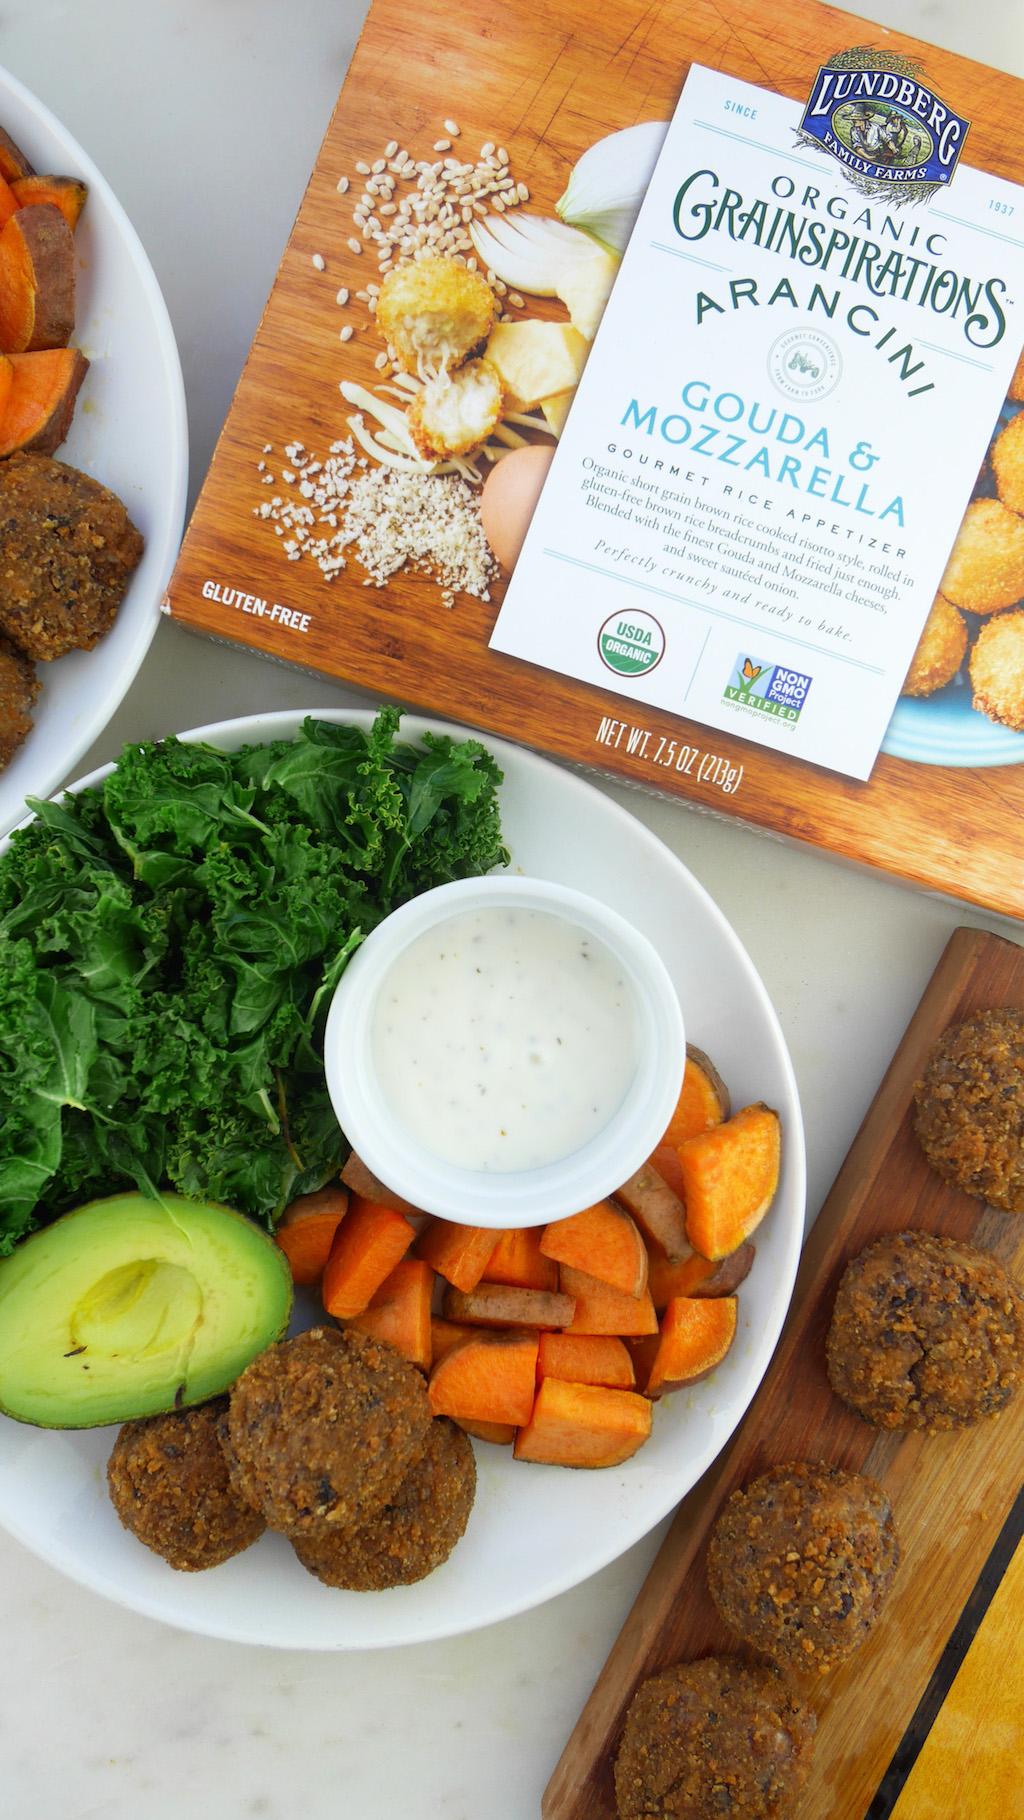 Lundberg Family Farms Arancini Lunch Plate